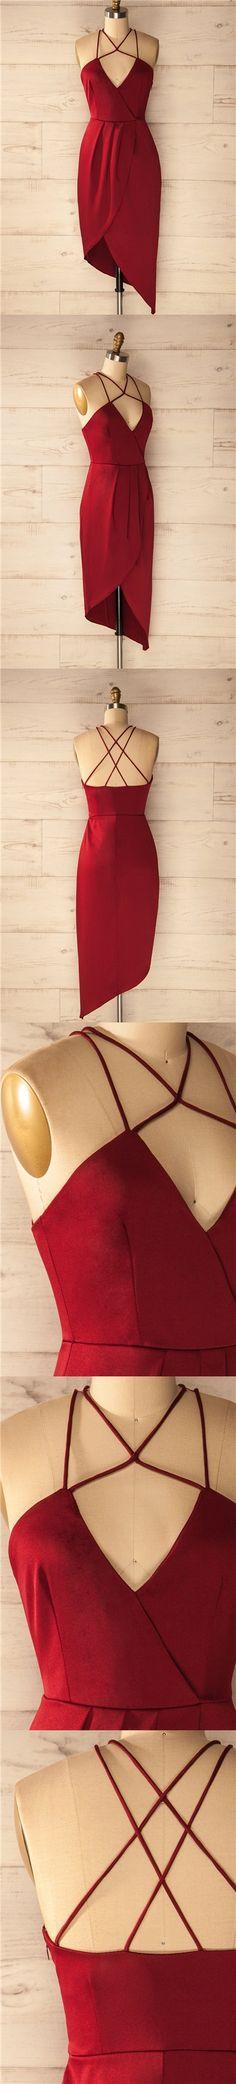 2017 Homecoming Dress Sexy Burgundy Halter Slit Short Prom Dress Party Dress JK174